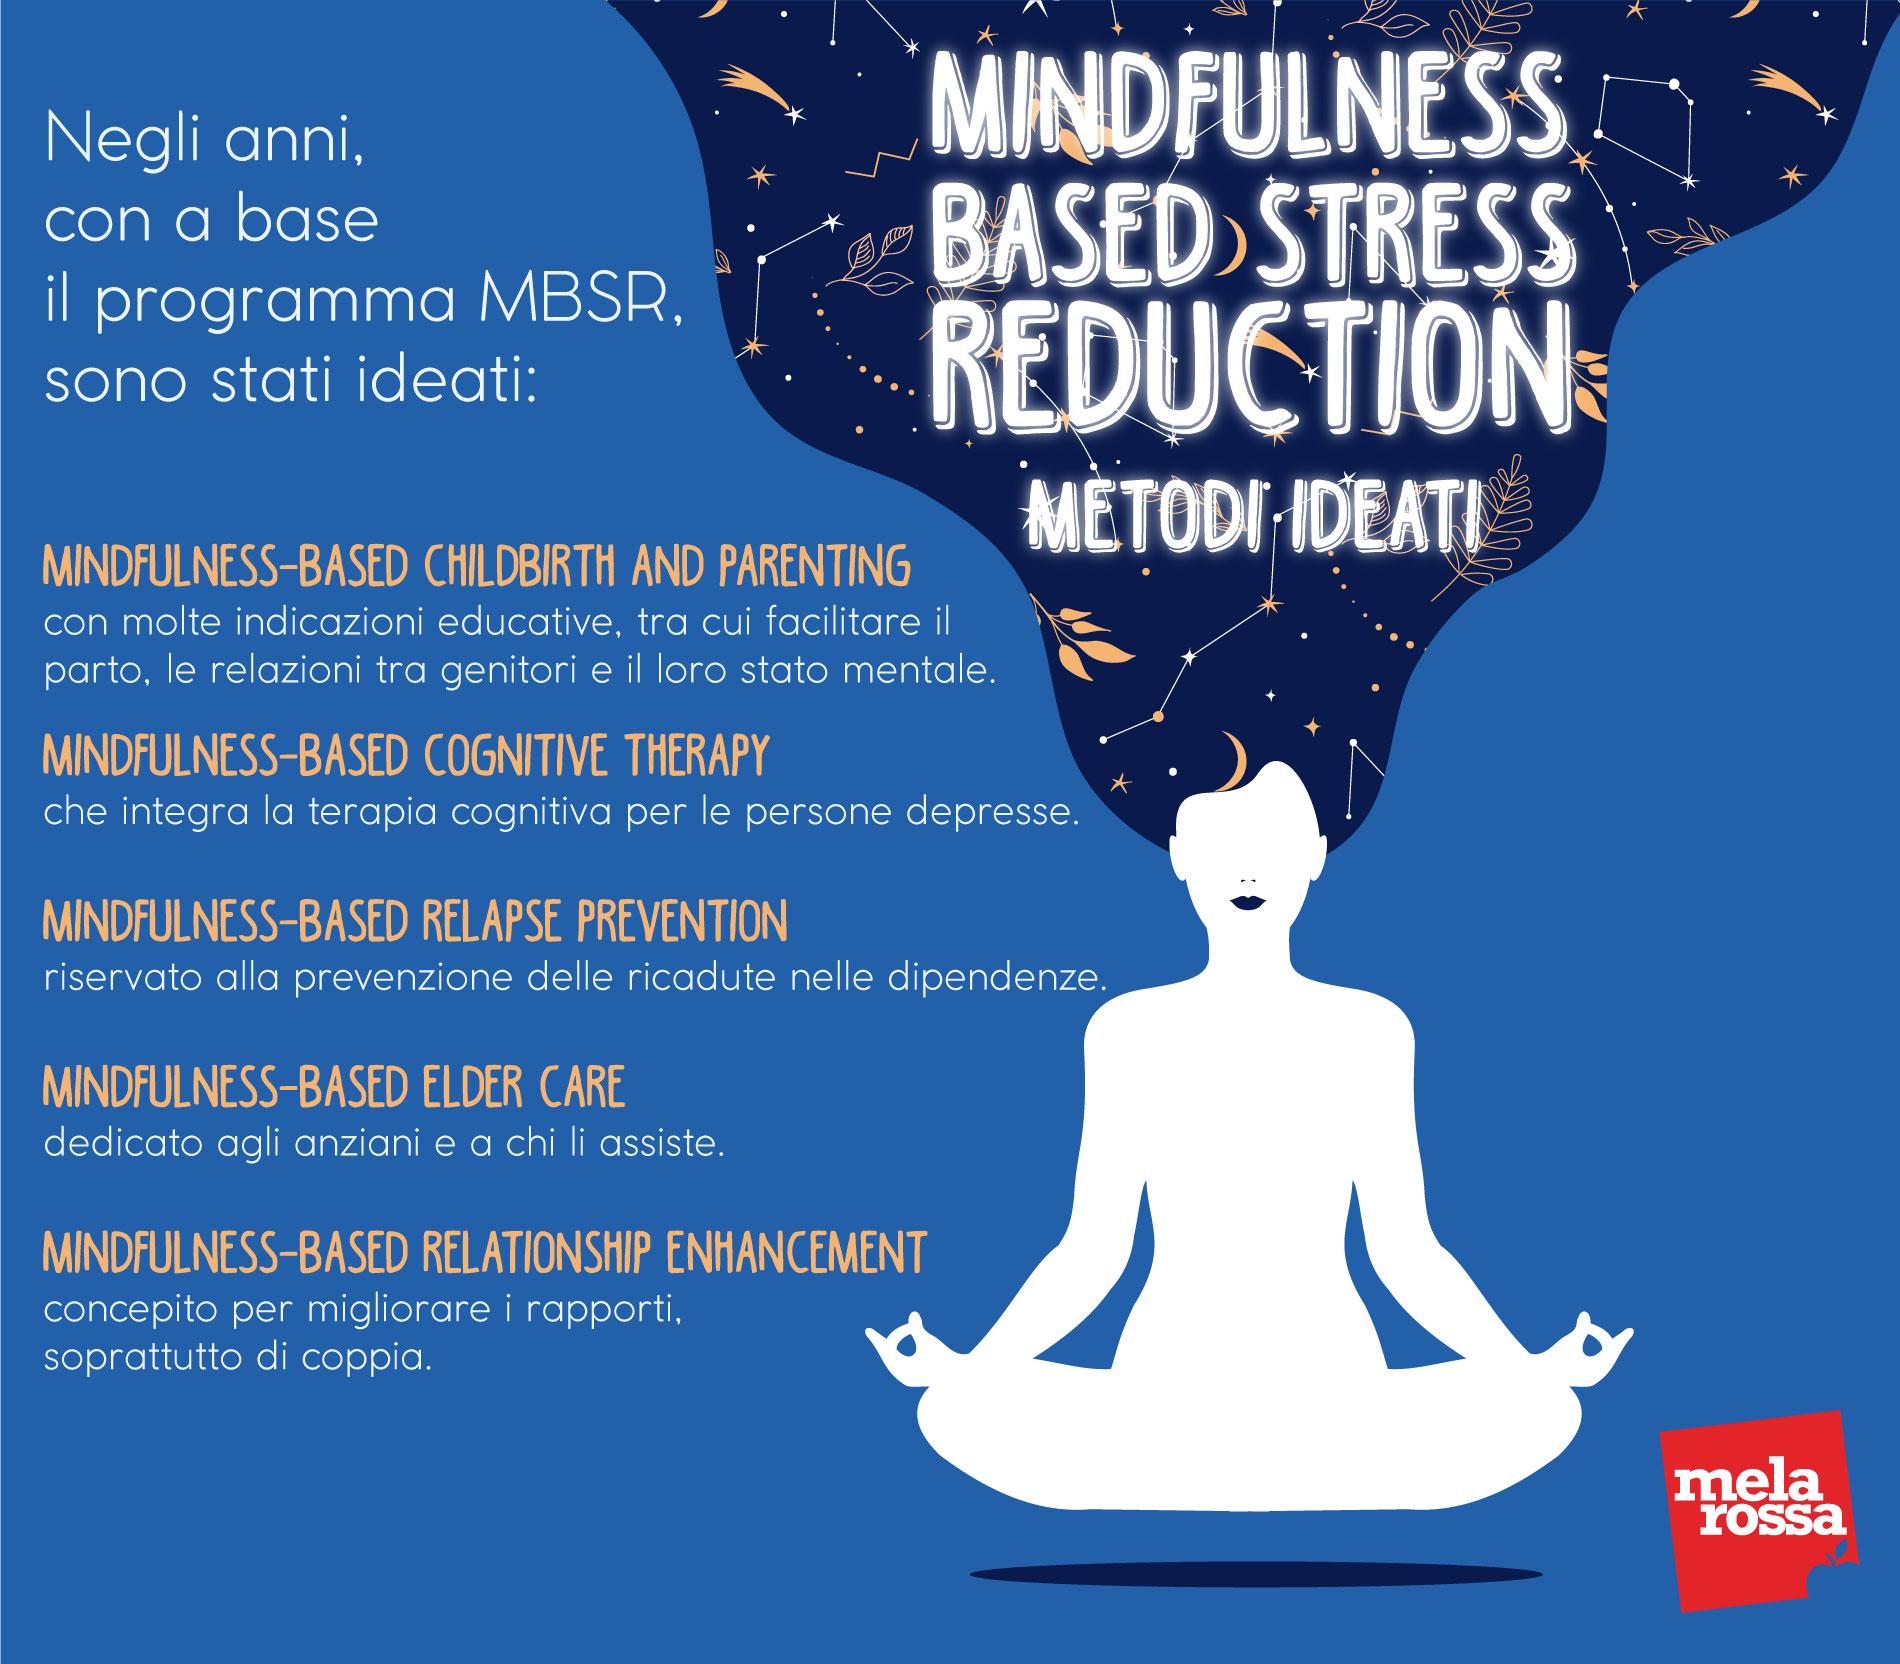 mindfulness: metodi ideati